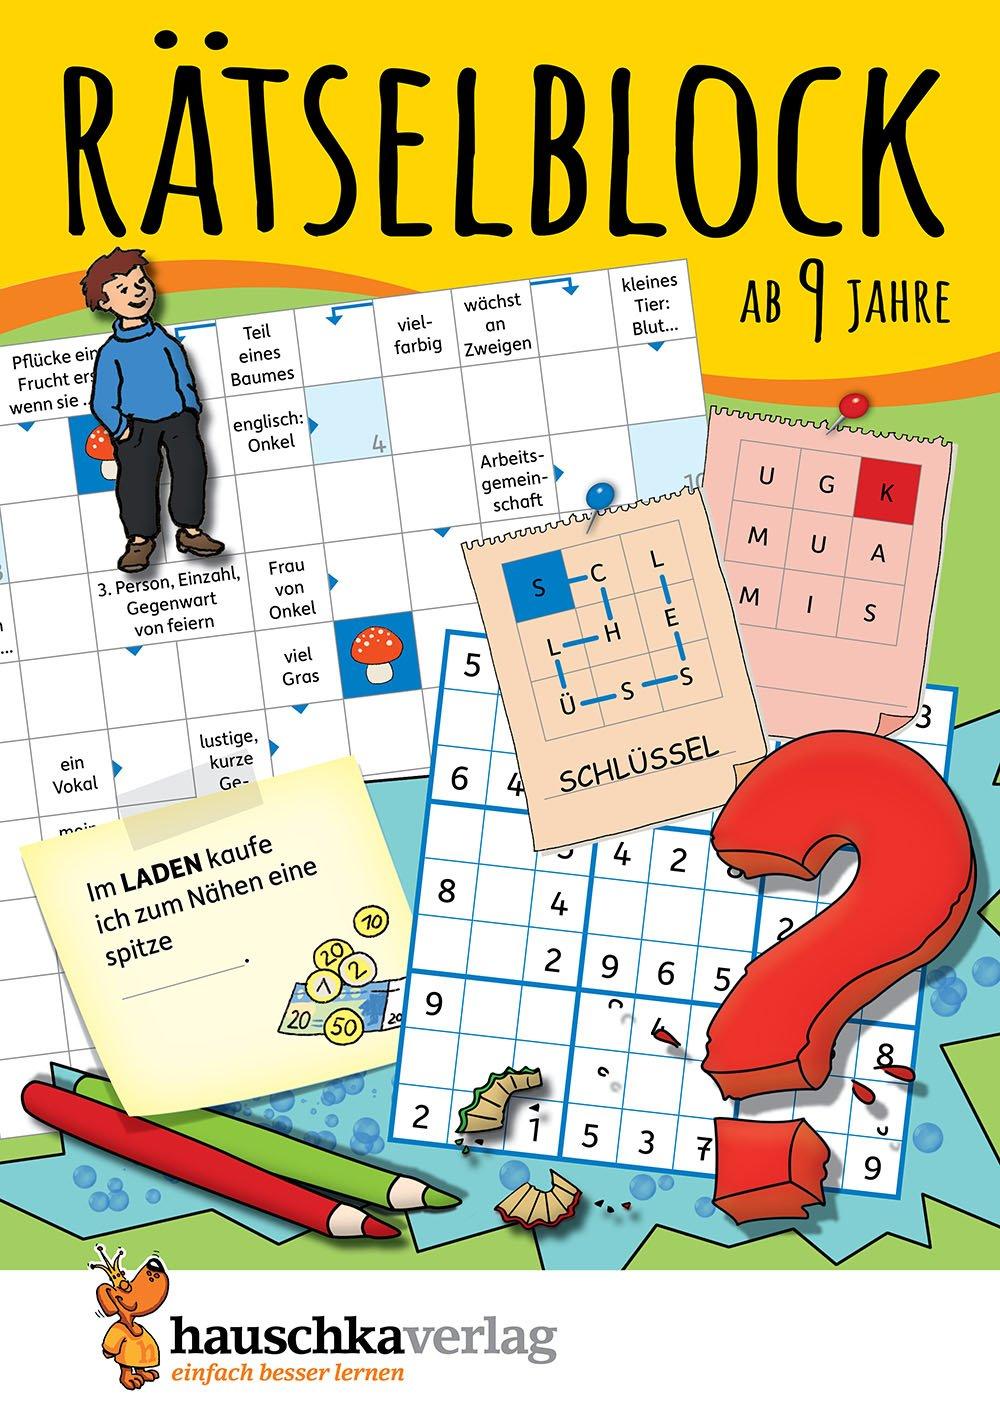 Rätselblock ab 9 Jahre: Kunterbunter Rätselspaß: Labyrinthe, Fehler ...